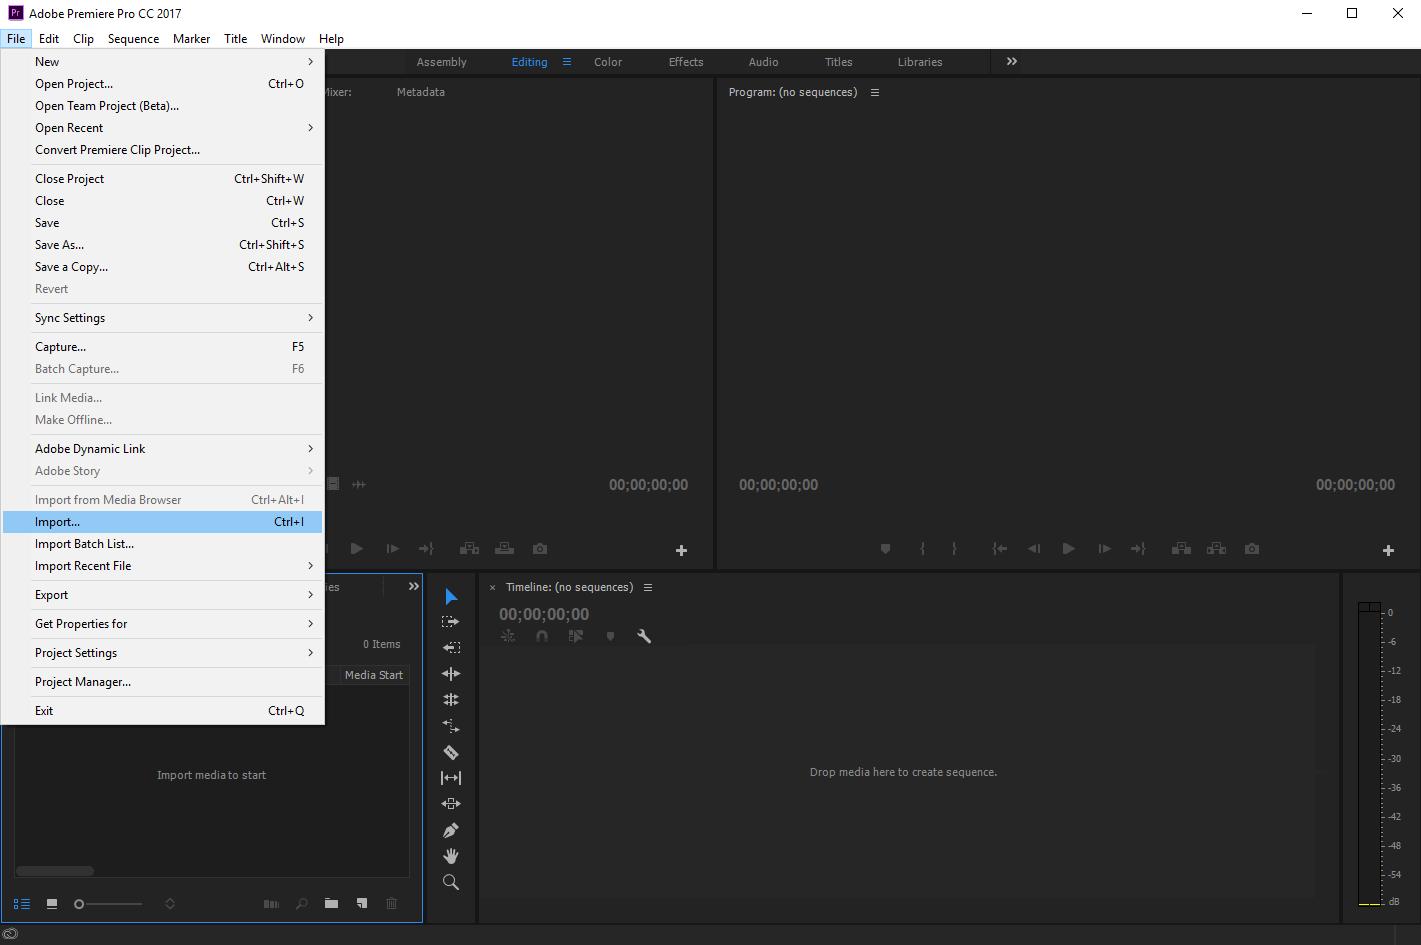 Adobe Premiere Pro導入文件